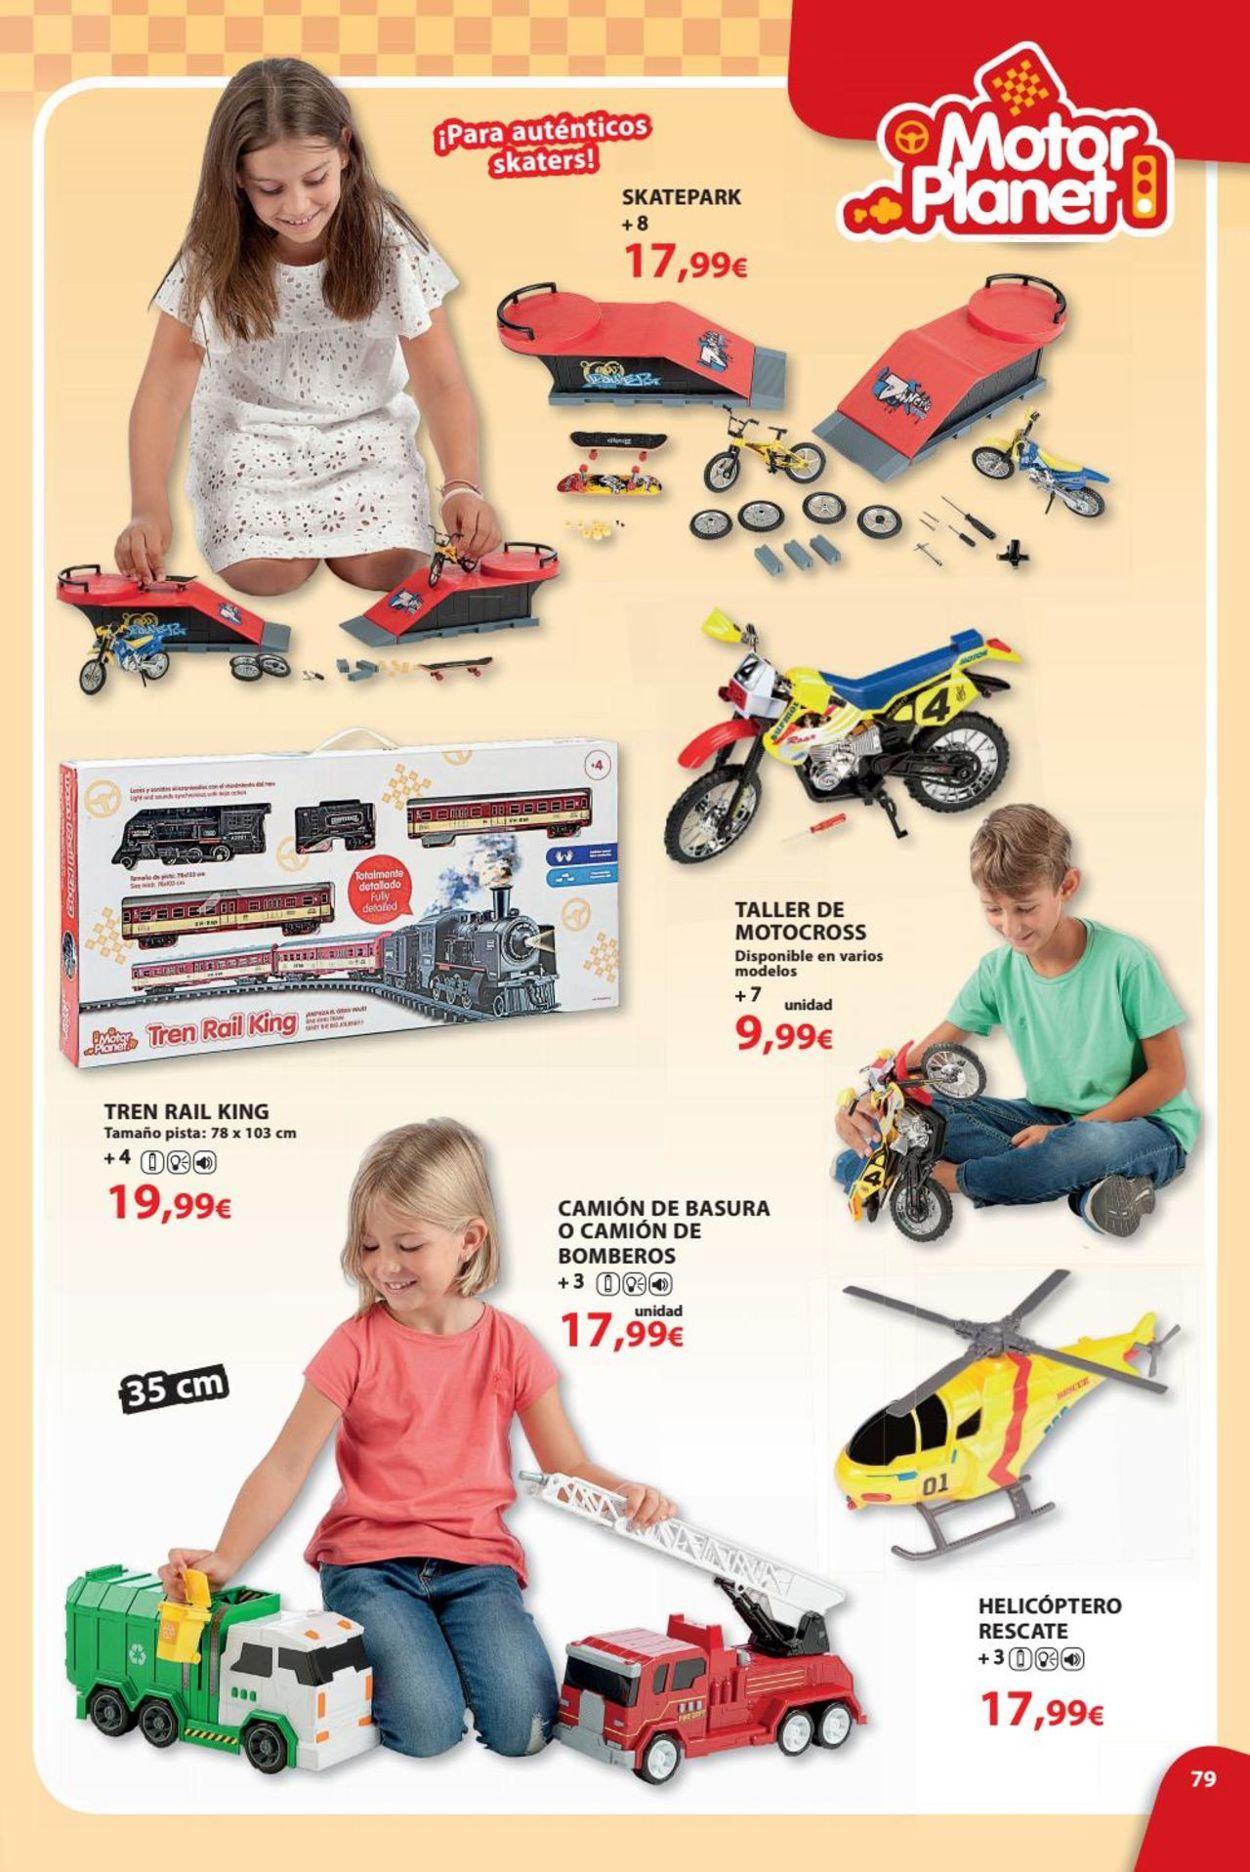 Toy Planet Folleto - 08.06-31.07.2019 (Página 79)